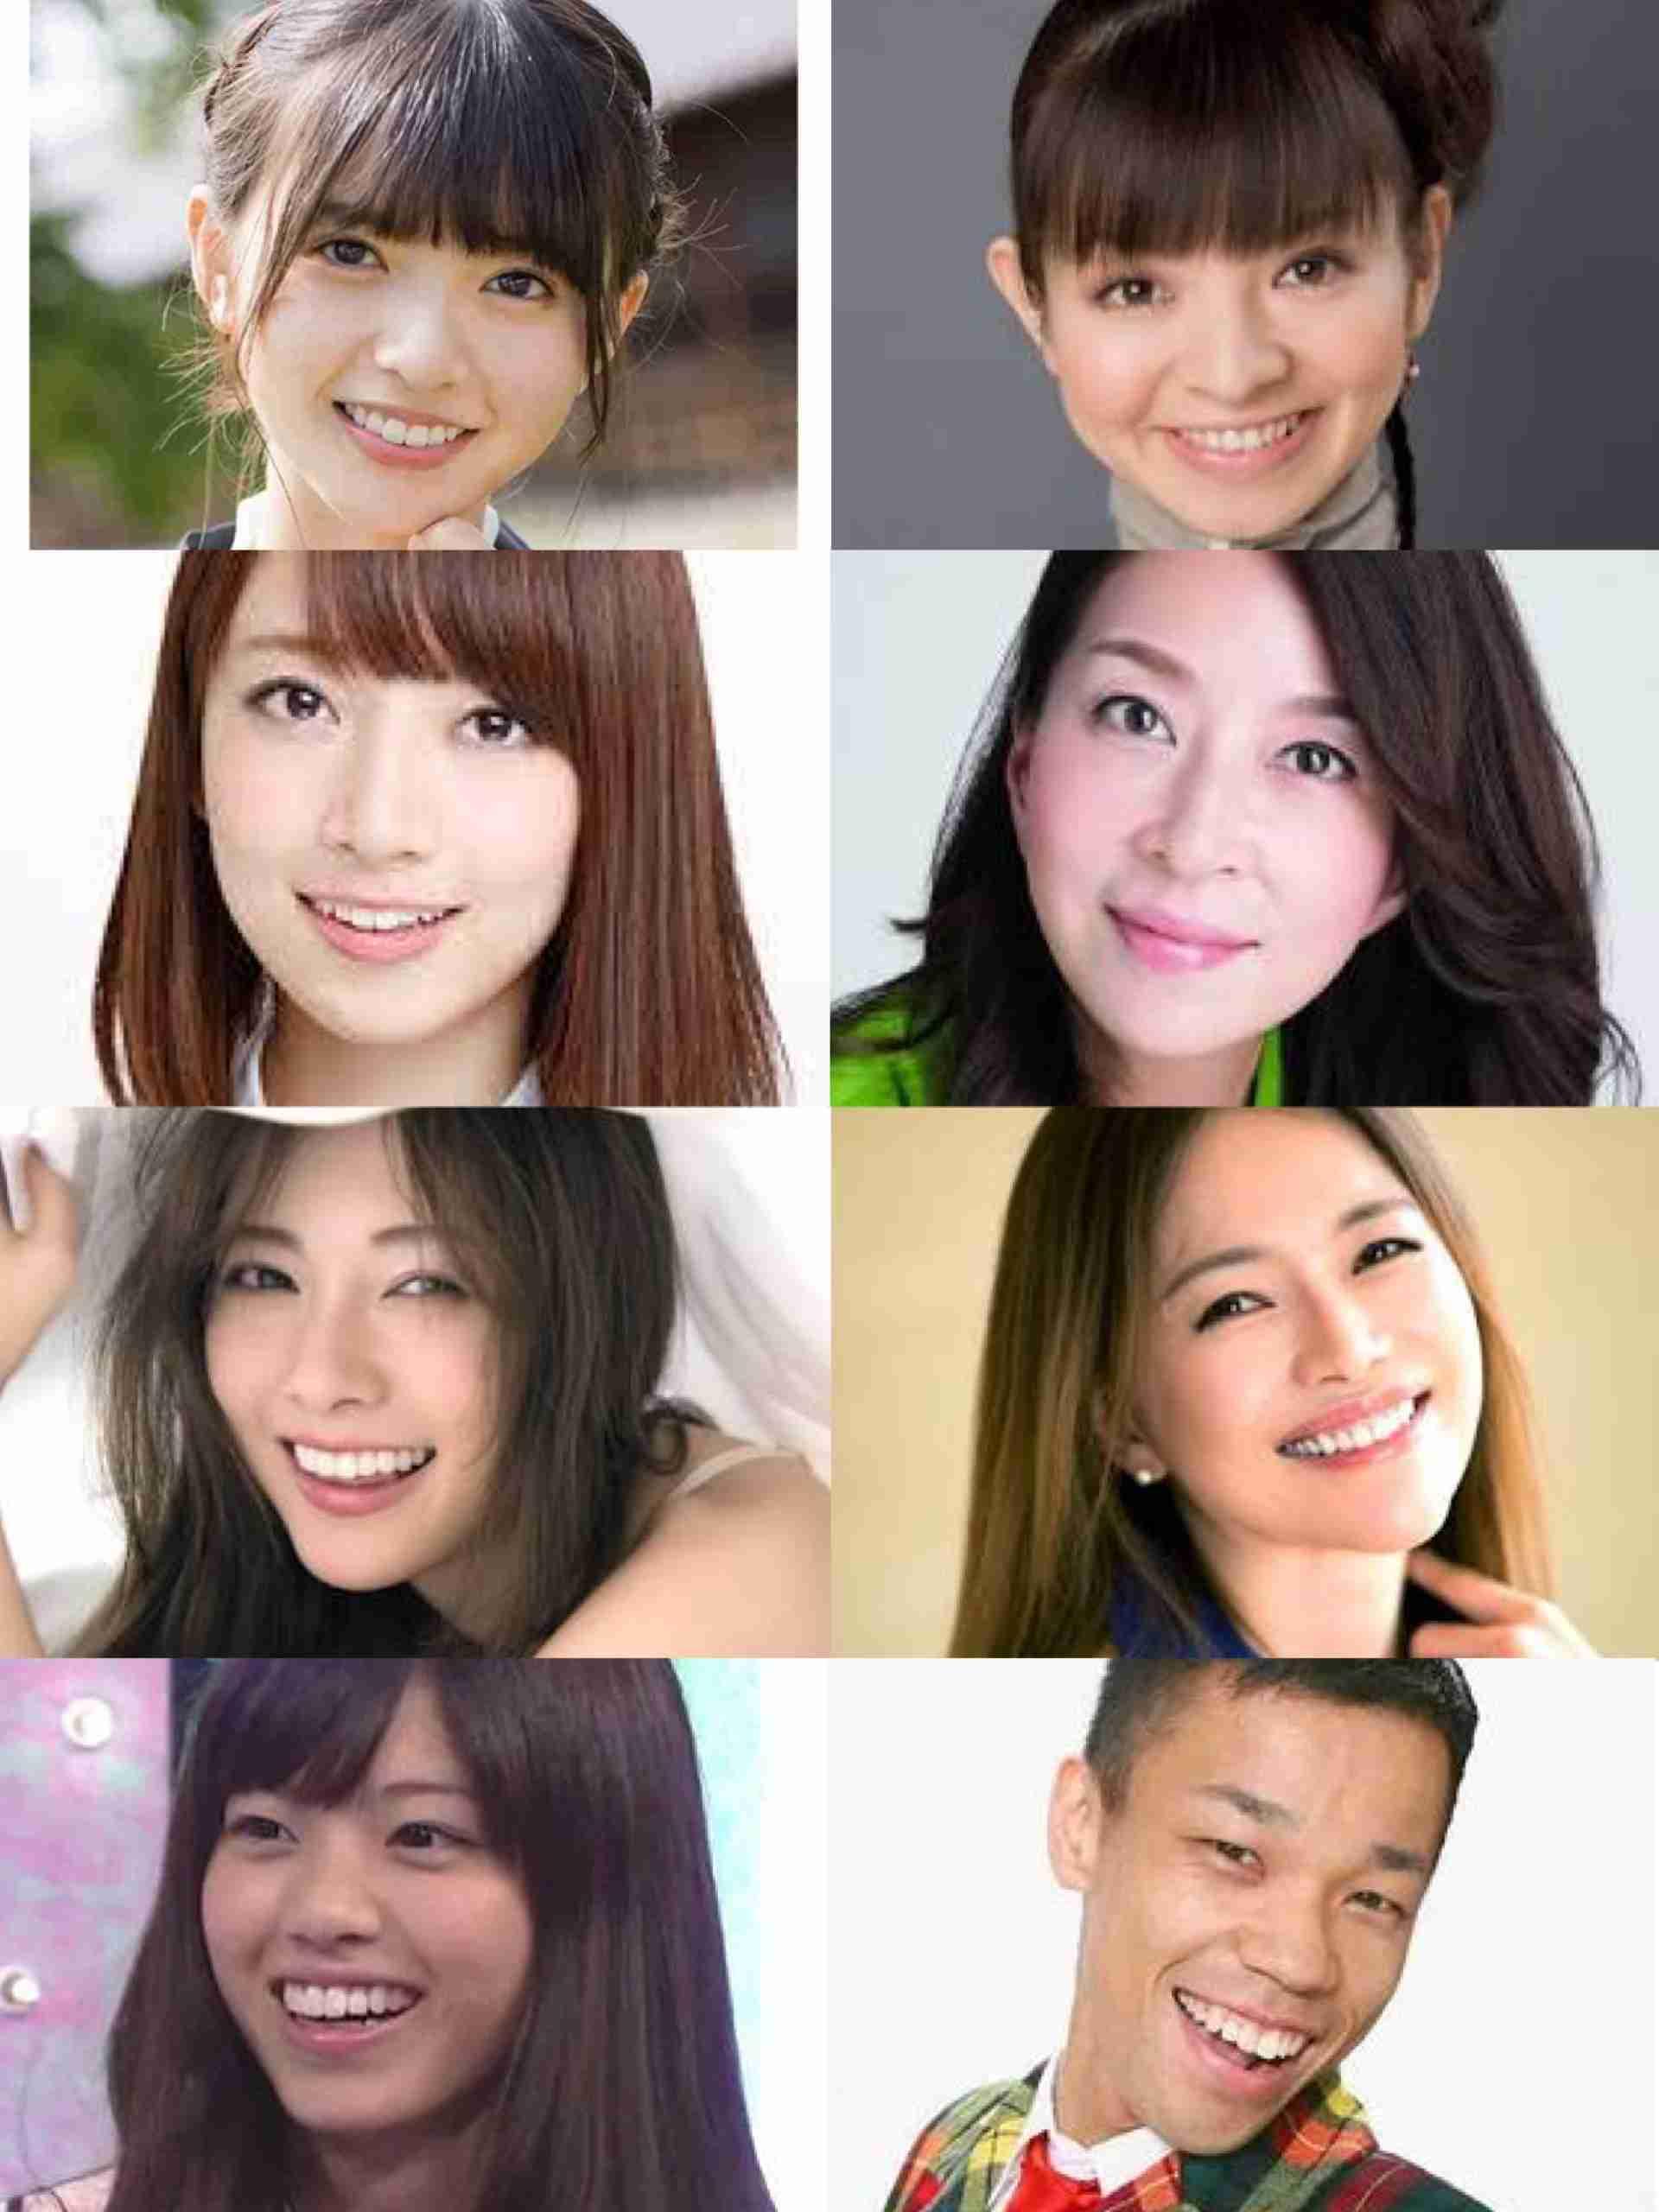 6・16「AKB48総選挙」フジテレビが生中継!宮根誠司&三田友梨佳が司会